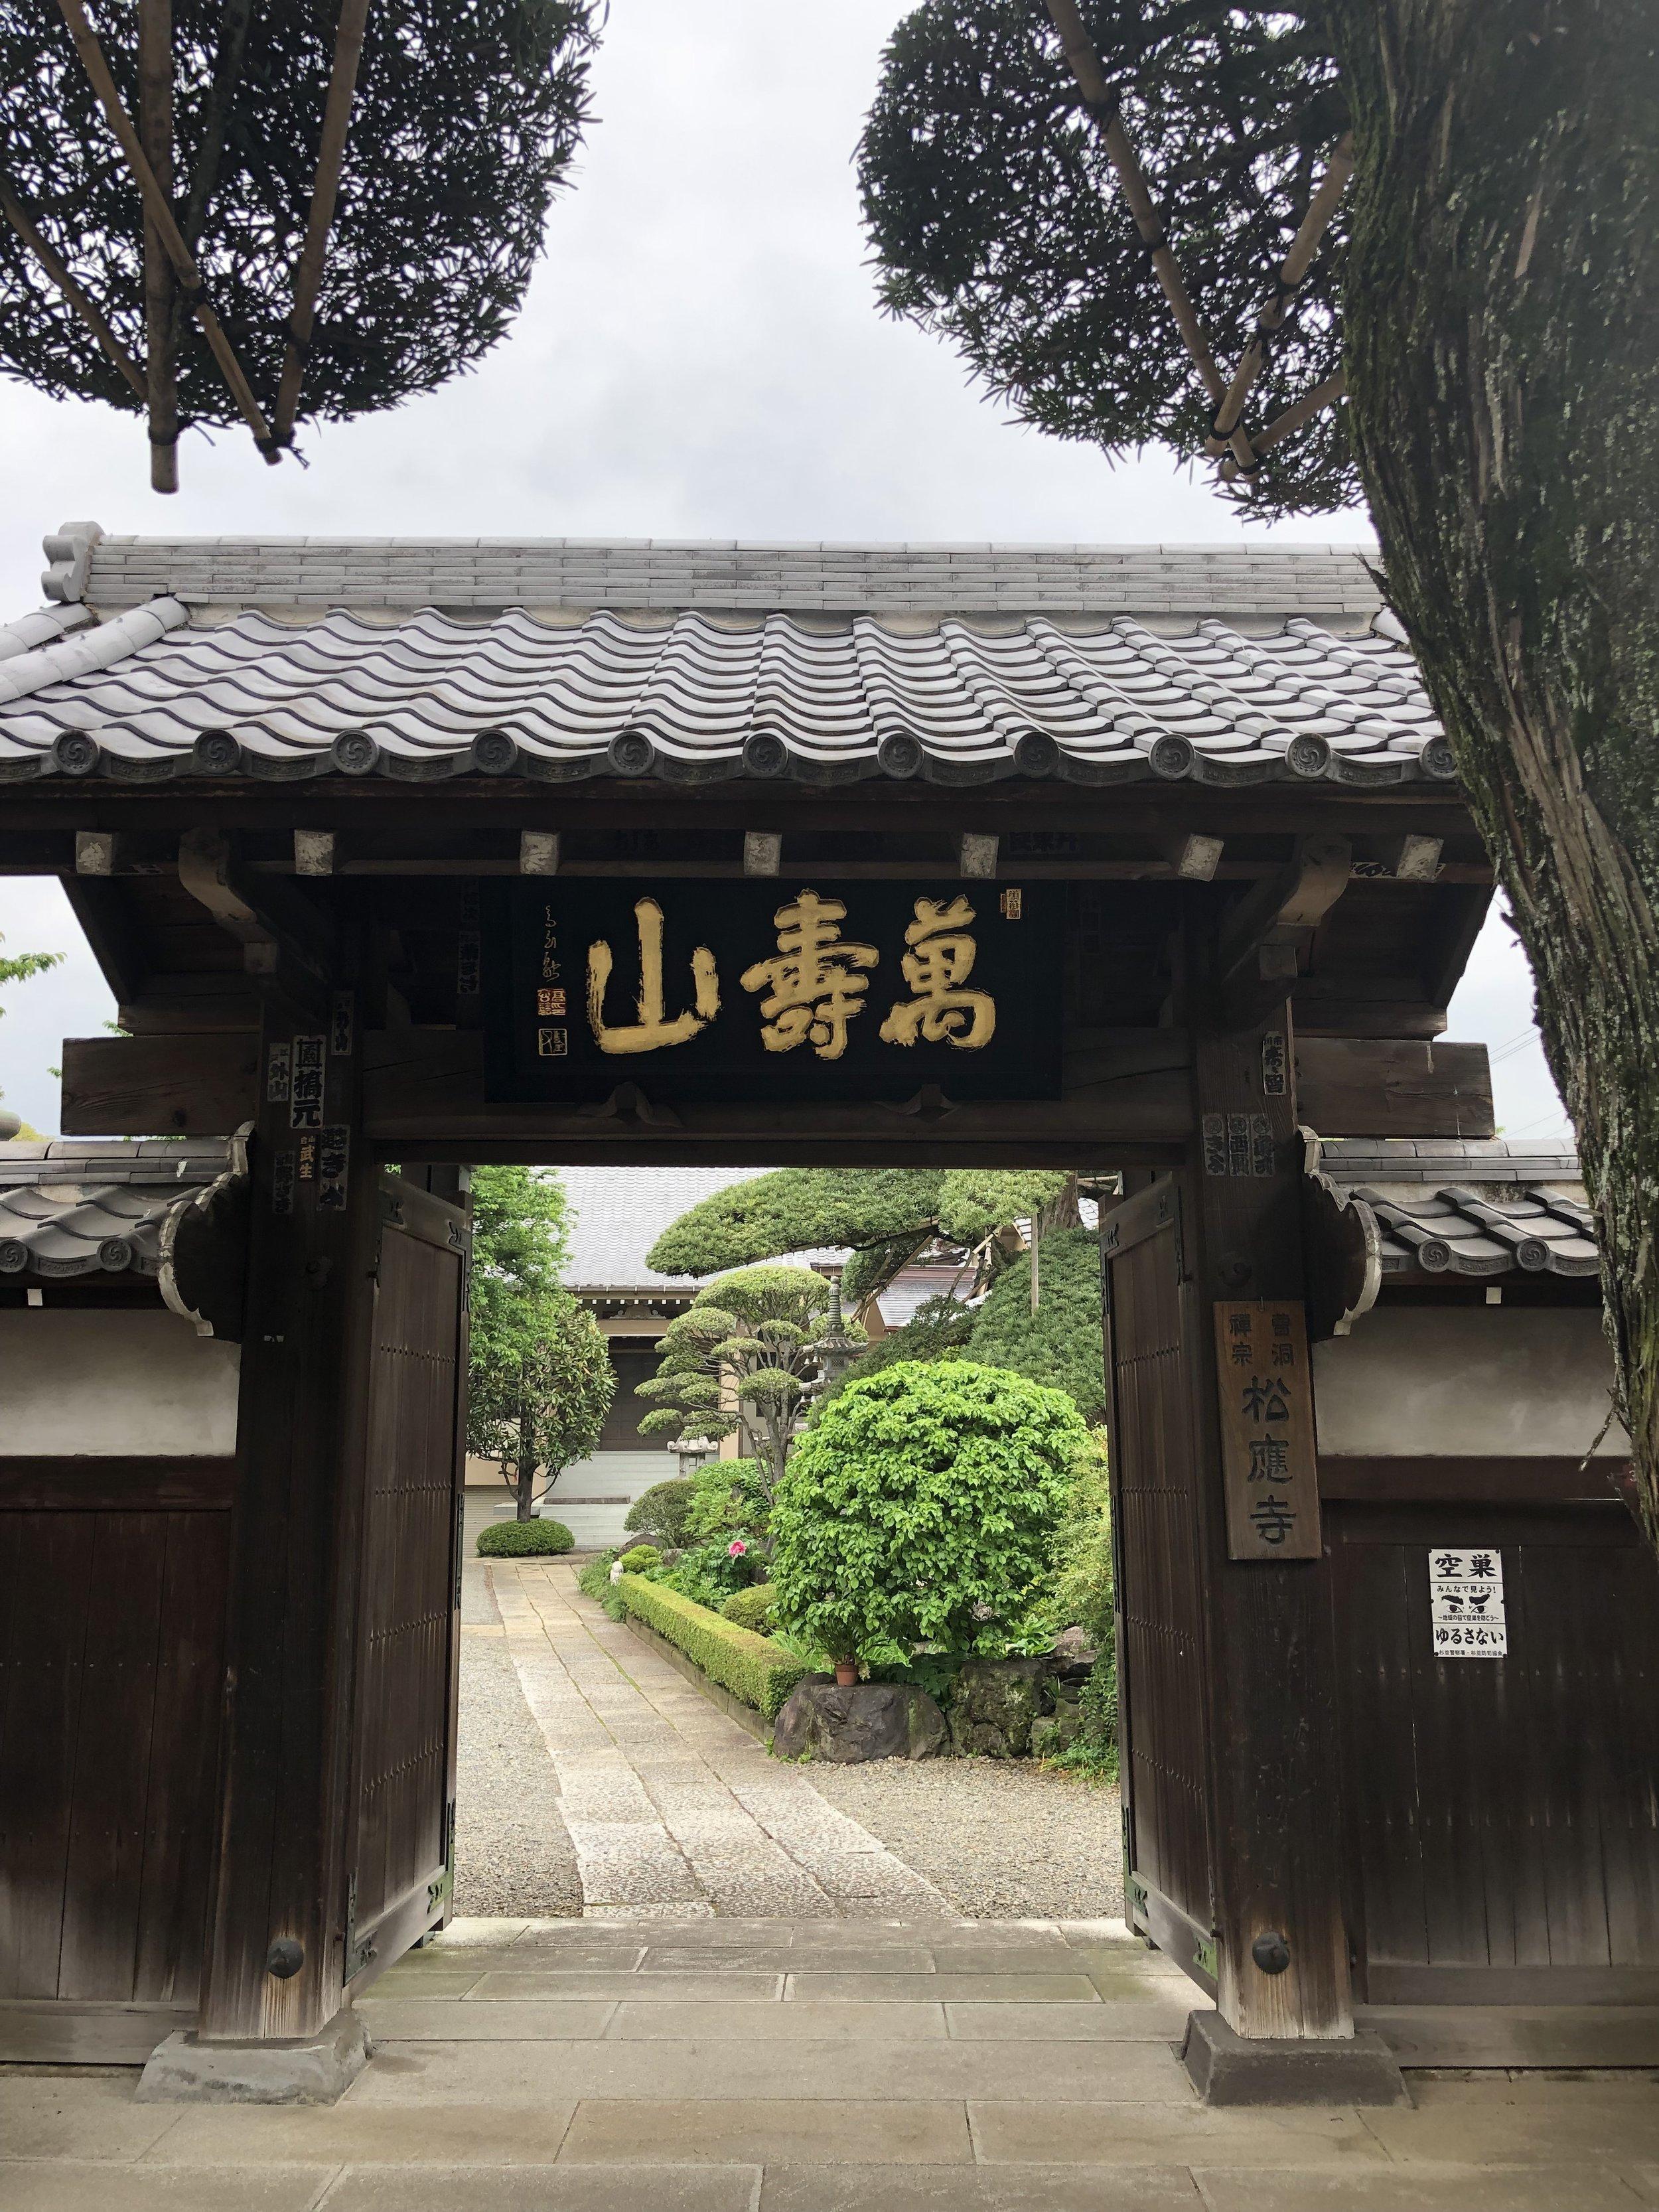 A local temple in Koenji